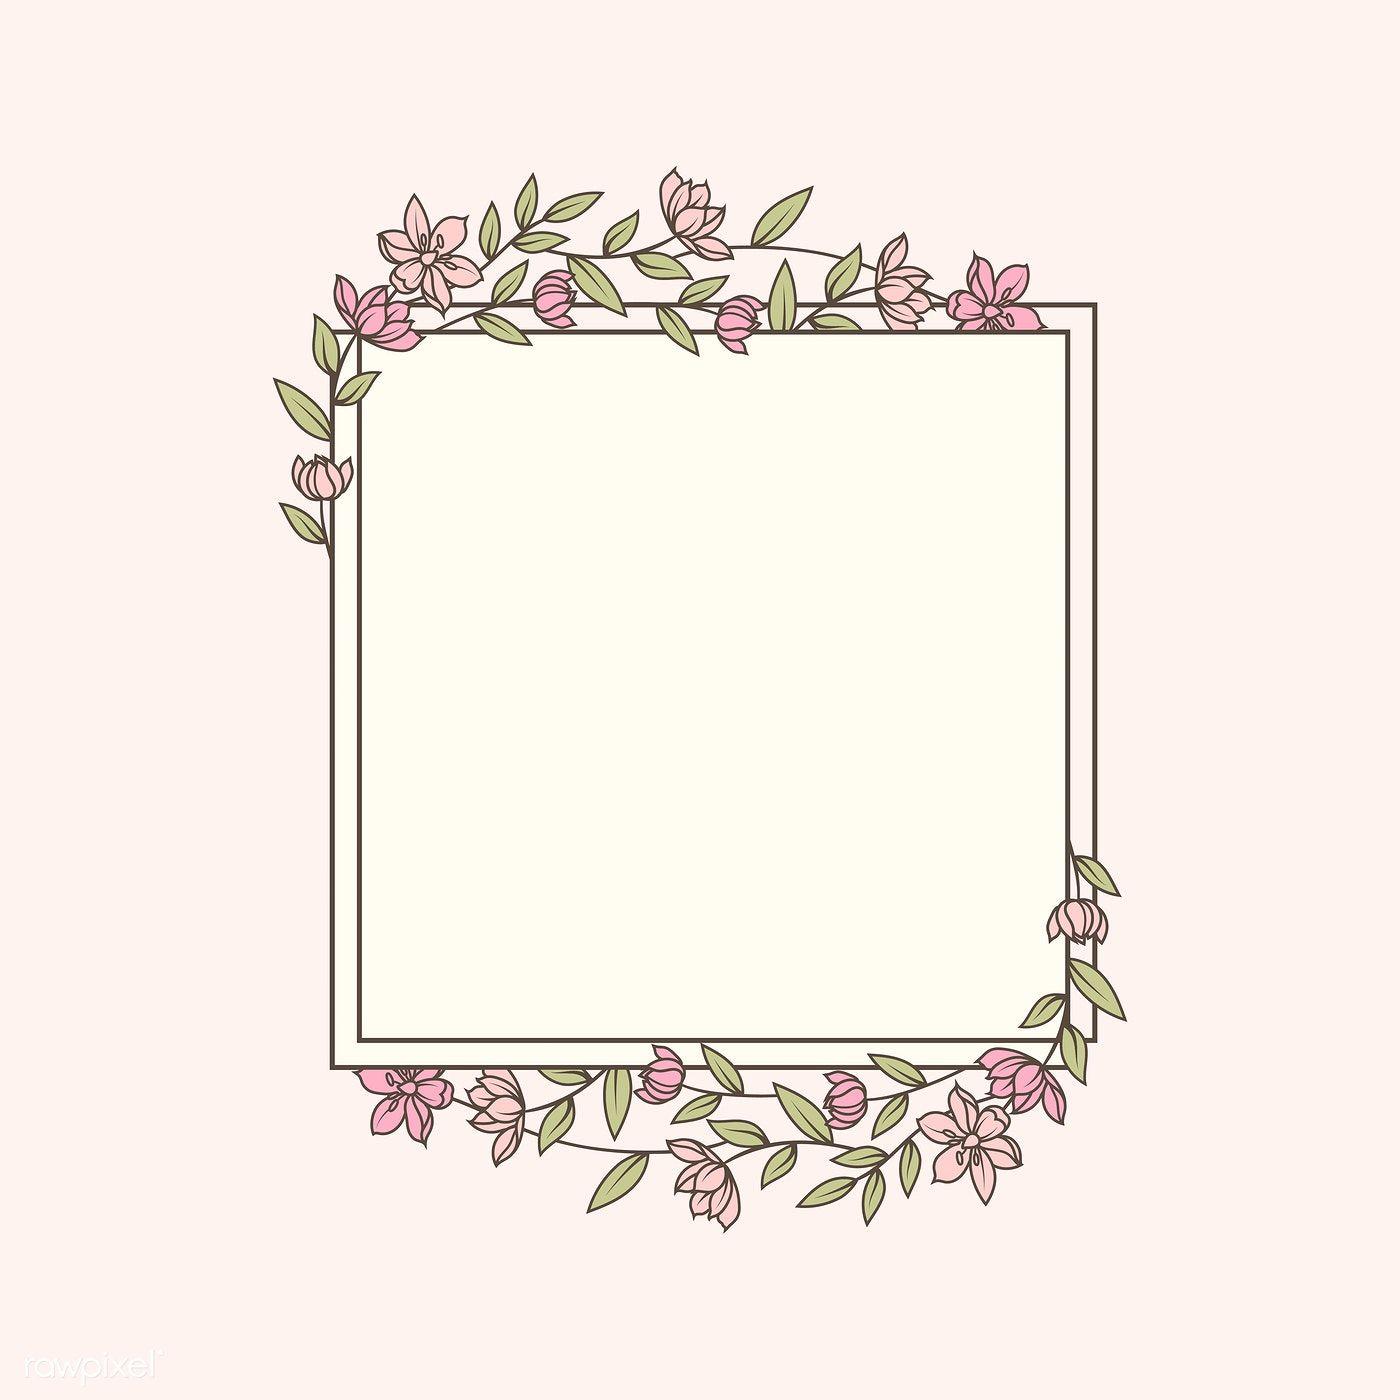 Frame Decorated With Flowers Vector Free Image By Rawpixel Com Manotang Floral Border Design Floral Logo Design Doodle Frames